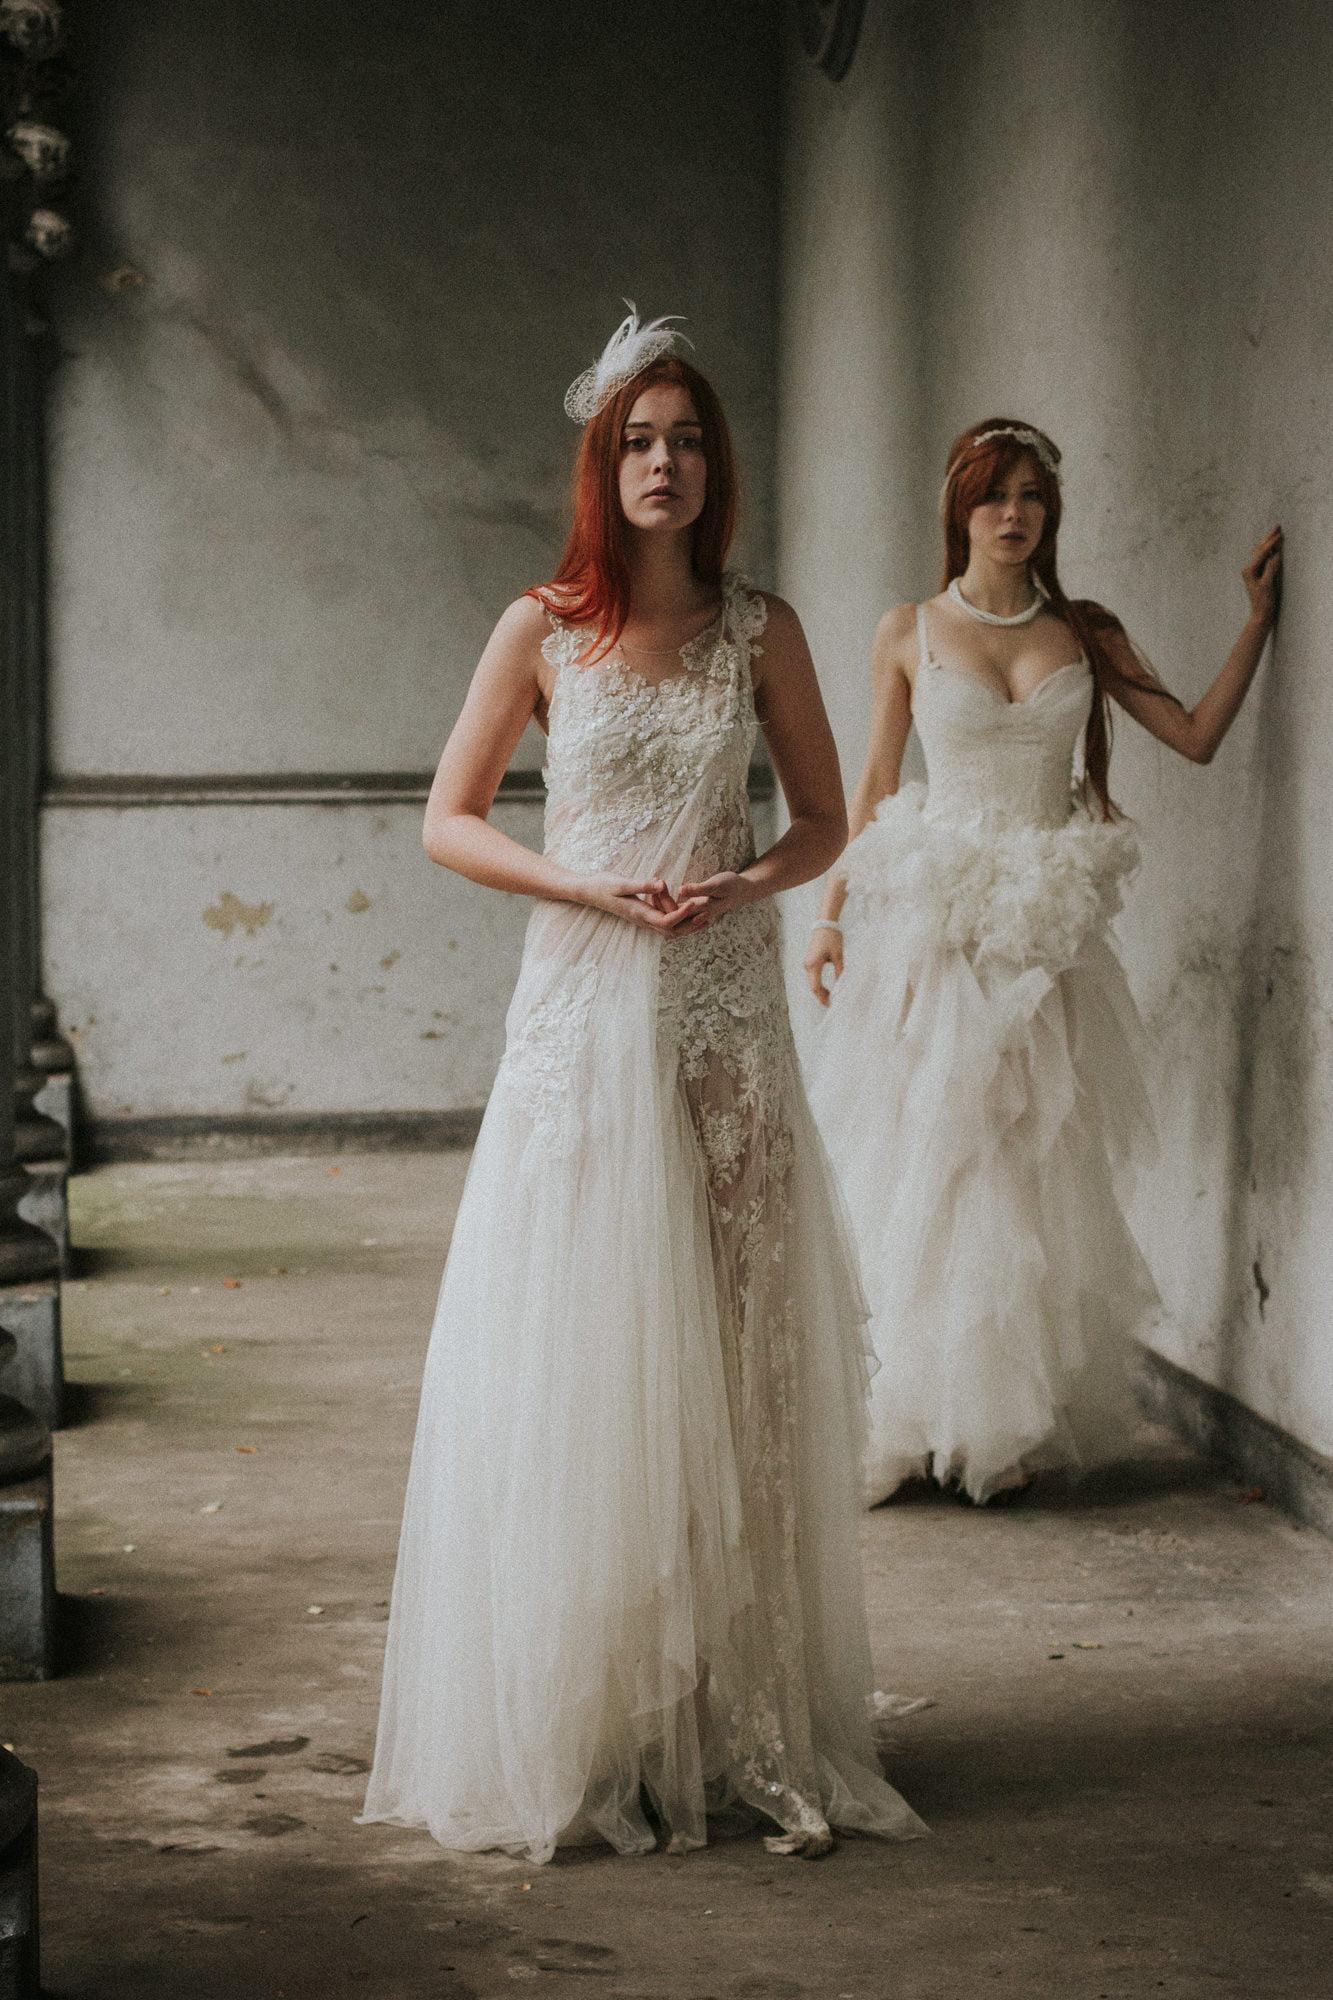 Modern romantic quirky wedding photographer Scotland